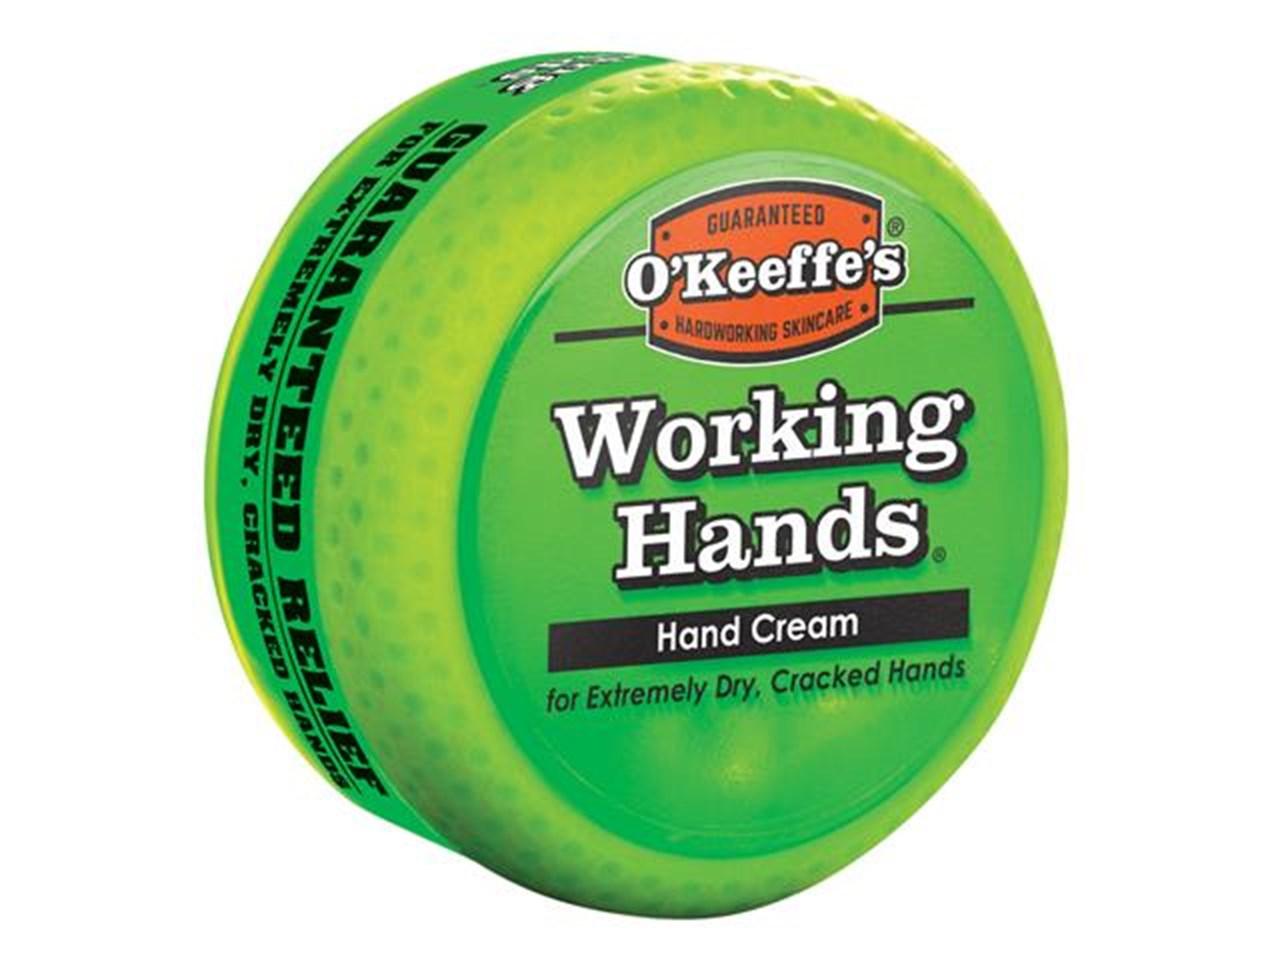 OKeeffes Hand Cream, Unscented (each) from Target Instacart